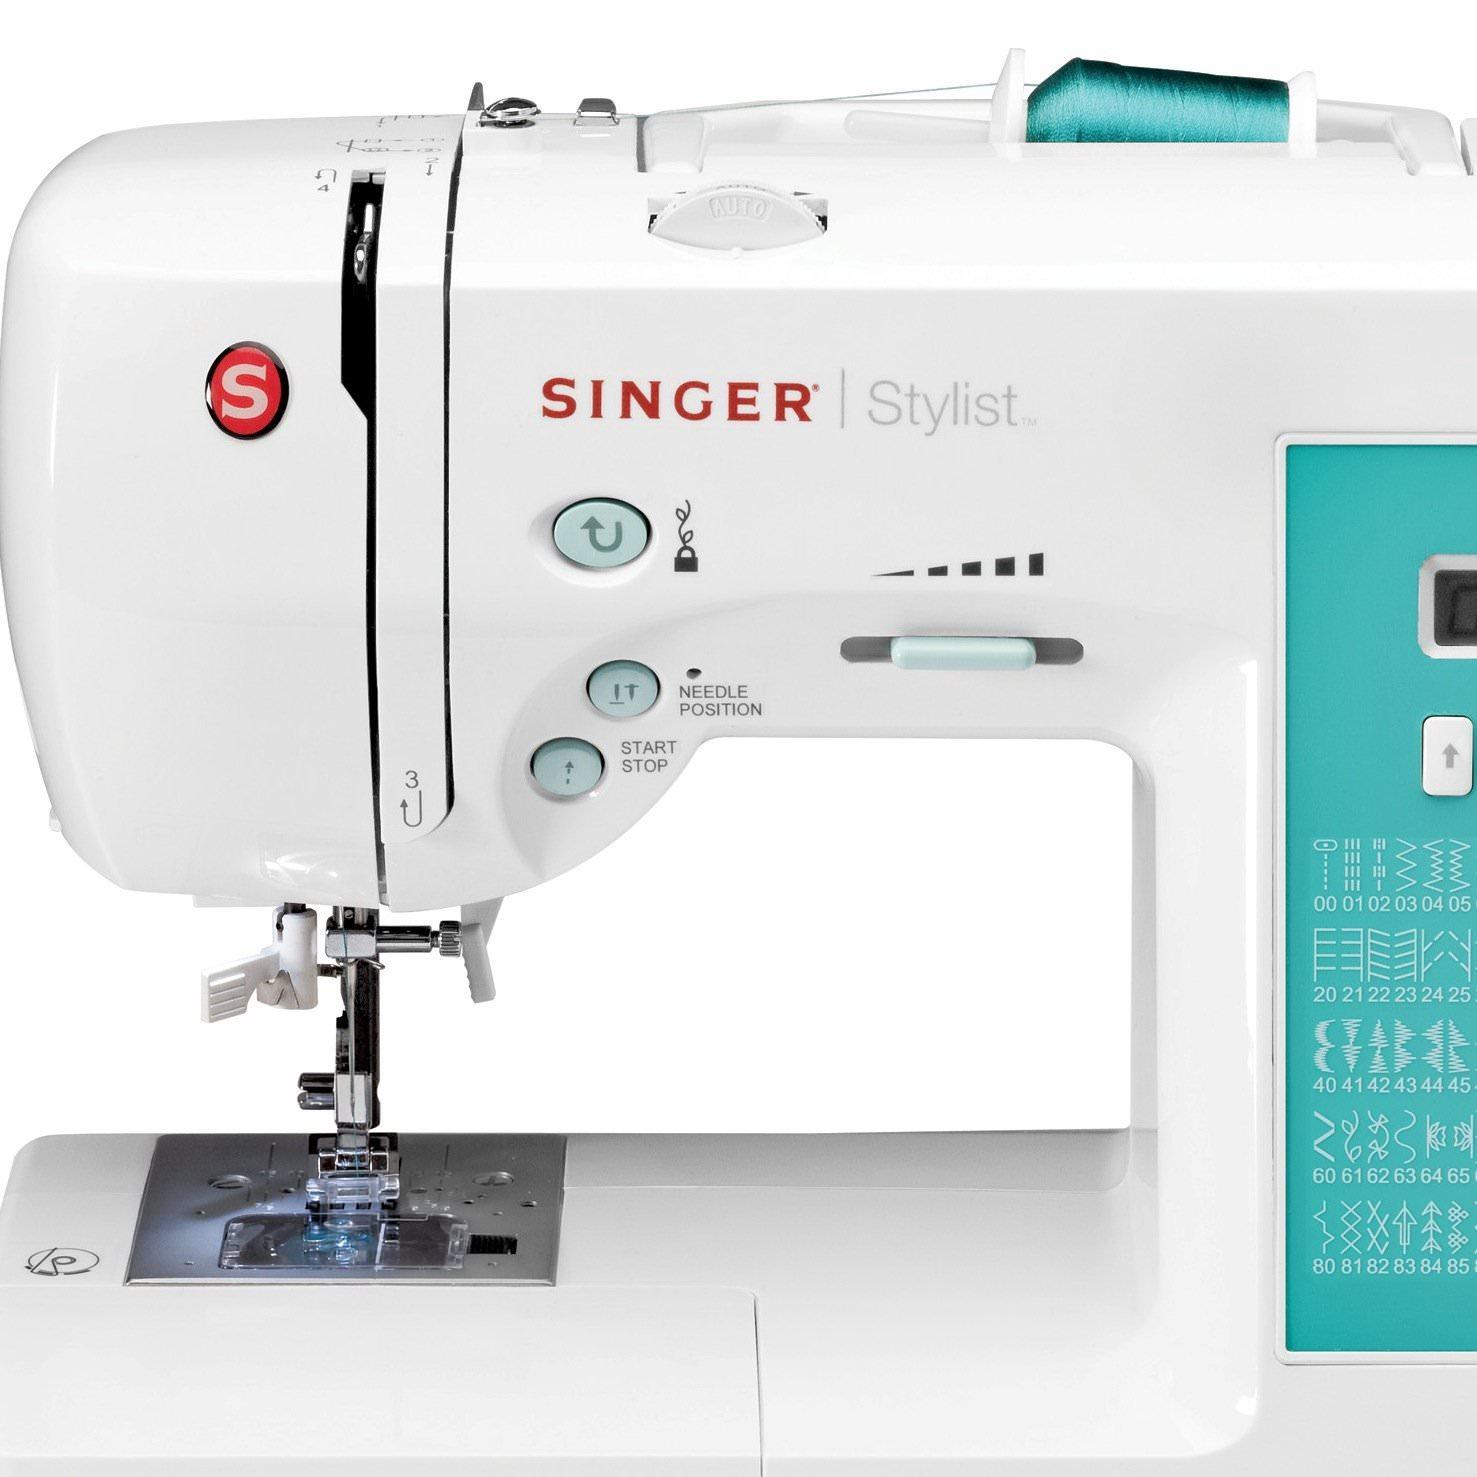 Singer 7258 Stylist Computerized 100 Stitch Sewing Machine Walmart Com